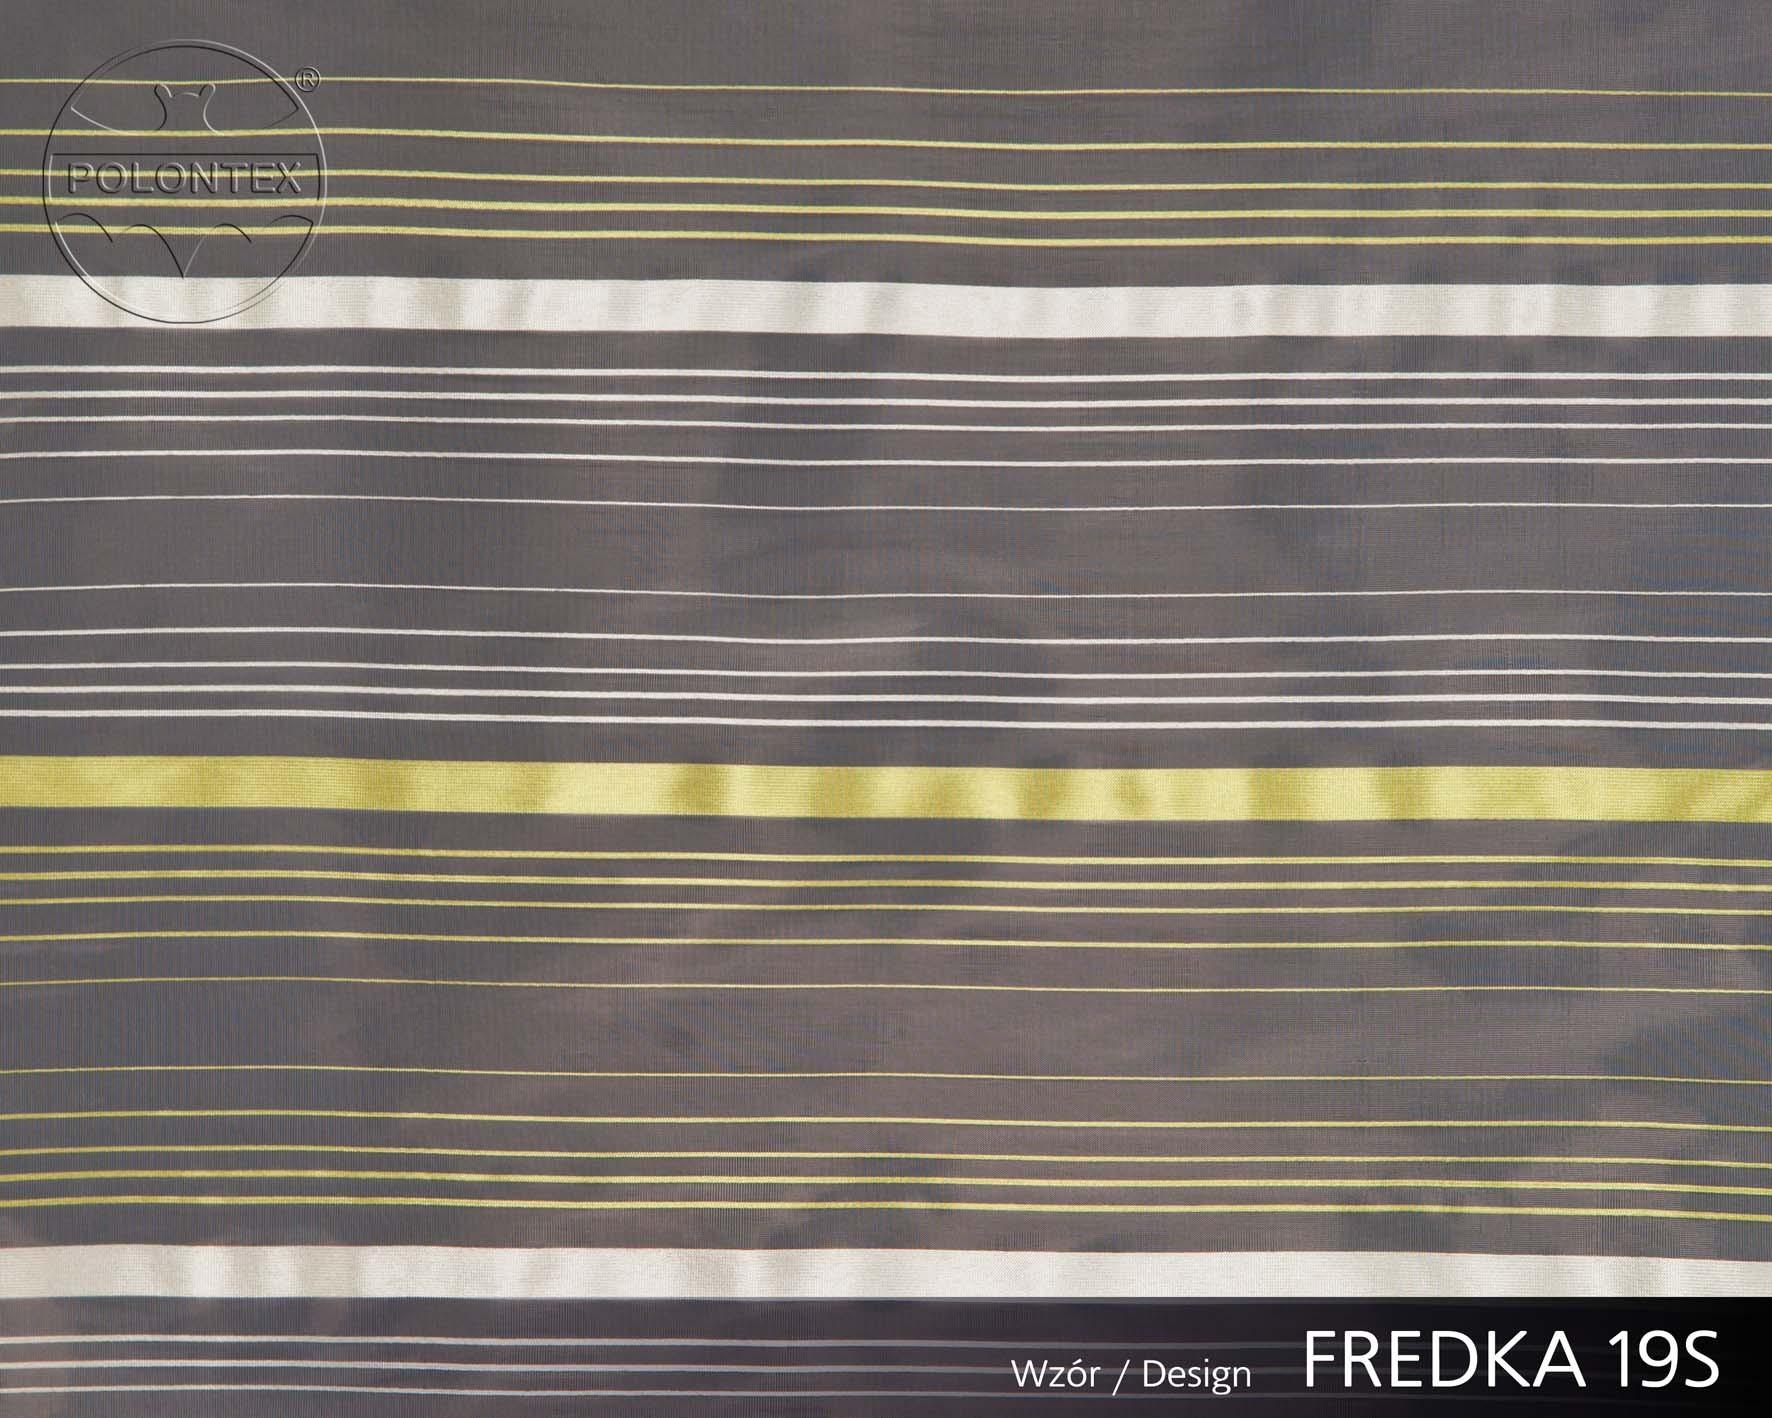 FREDKA 19S